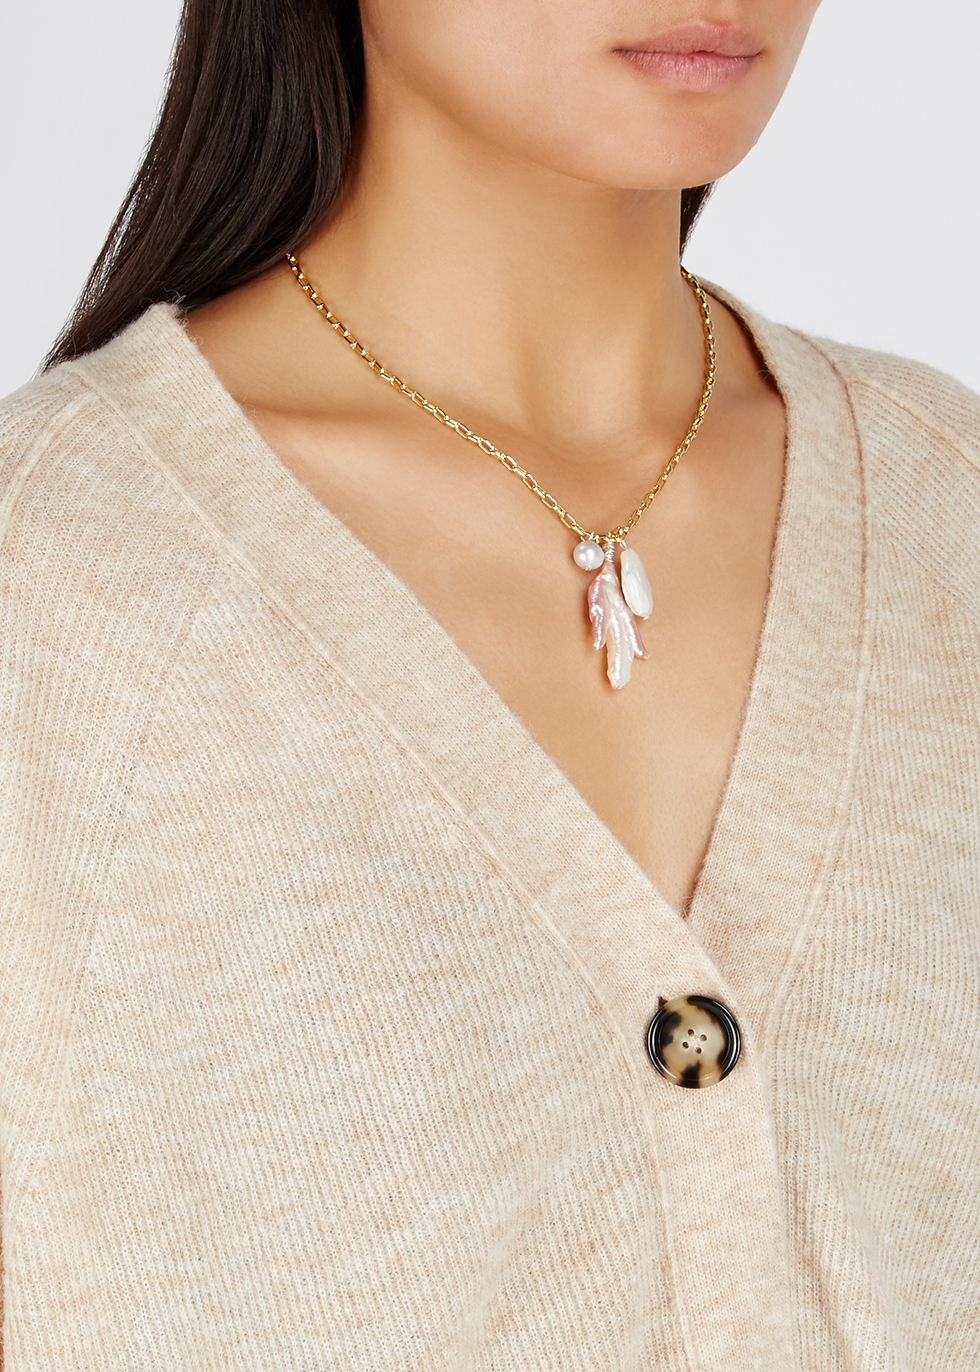 La Rêve gold-plated necklace - WALD Berlin